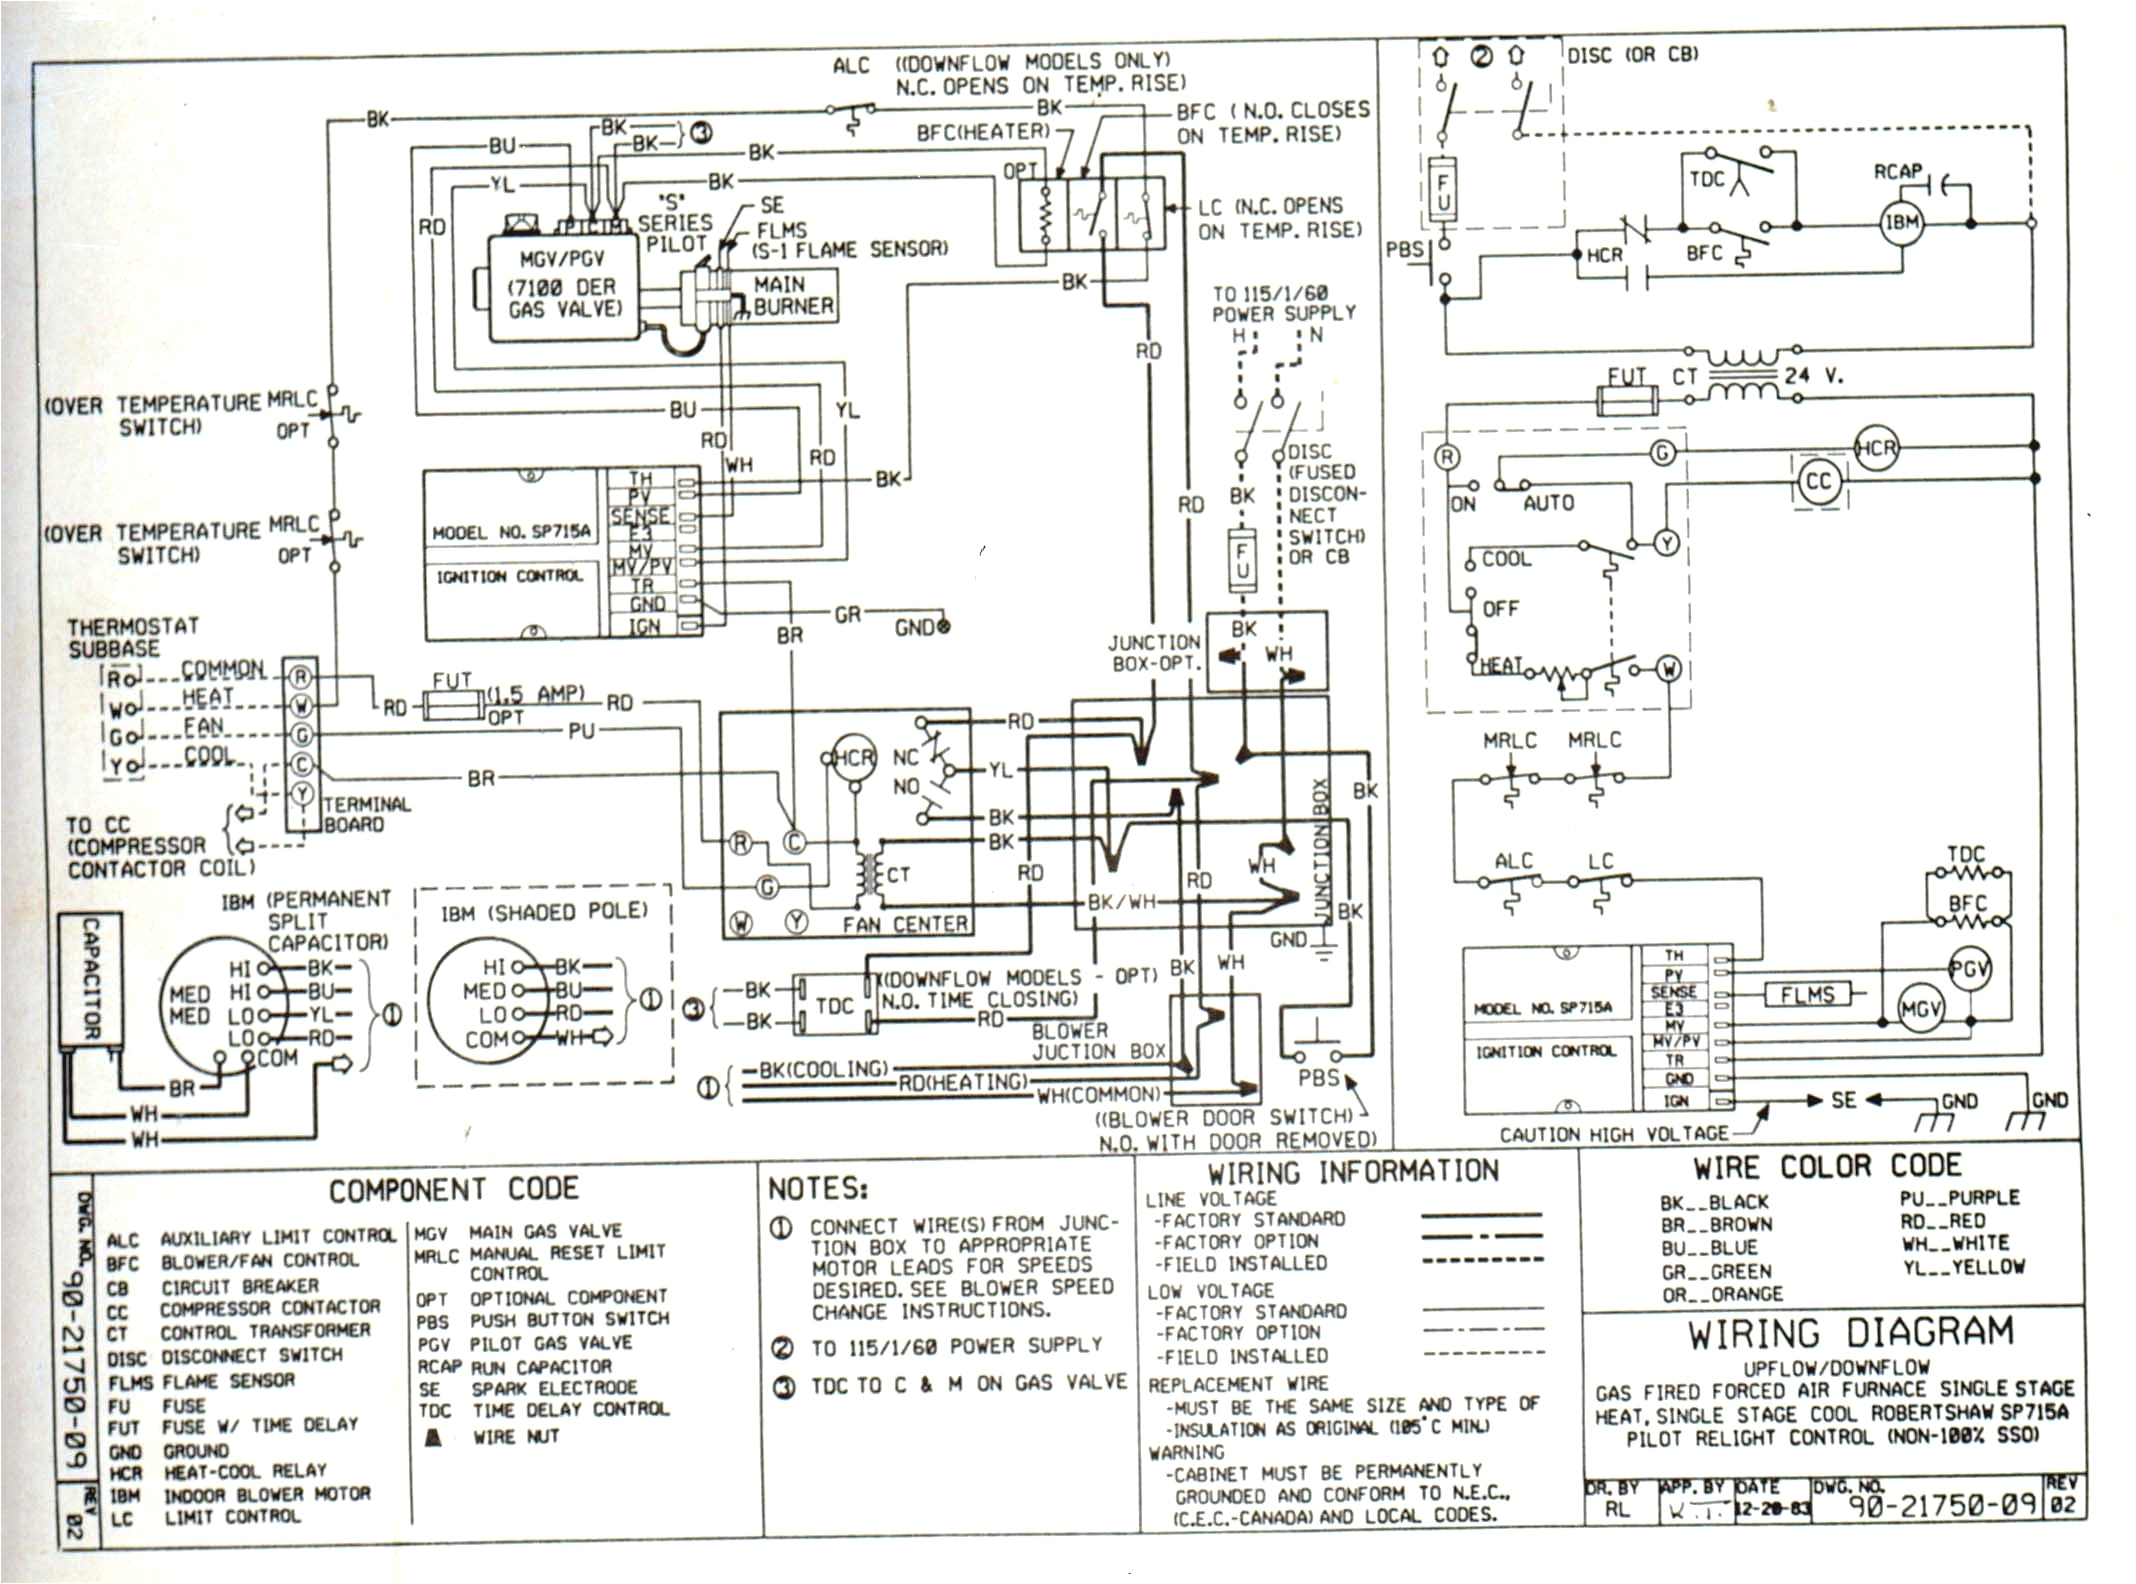 uc 400 wiring diagram